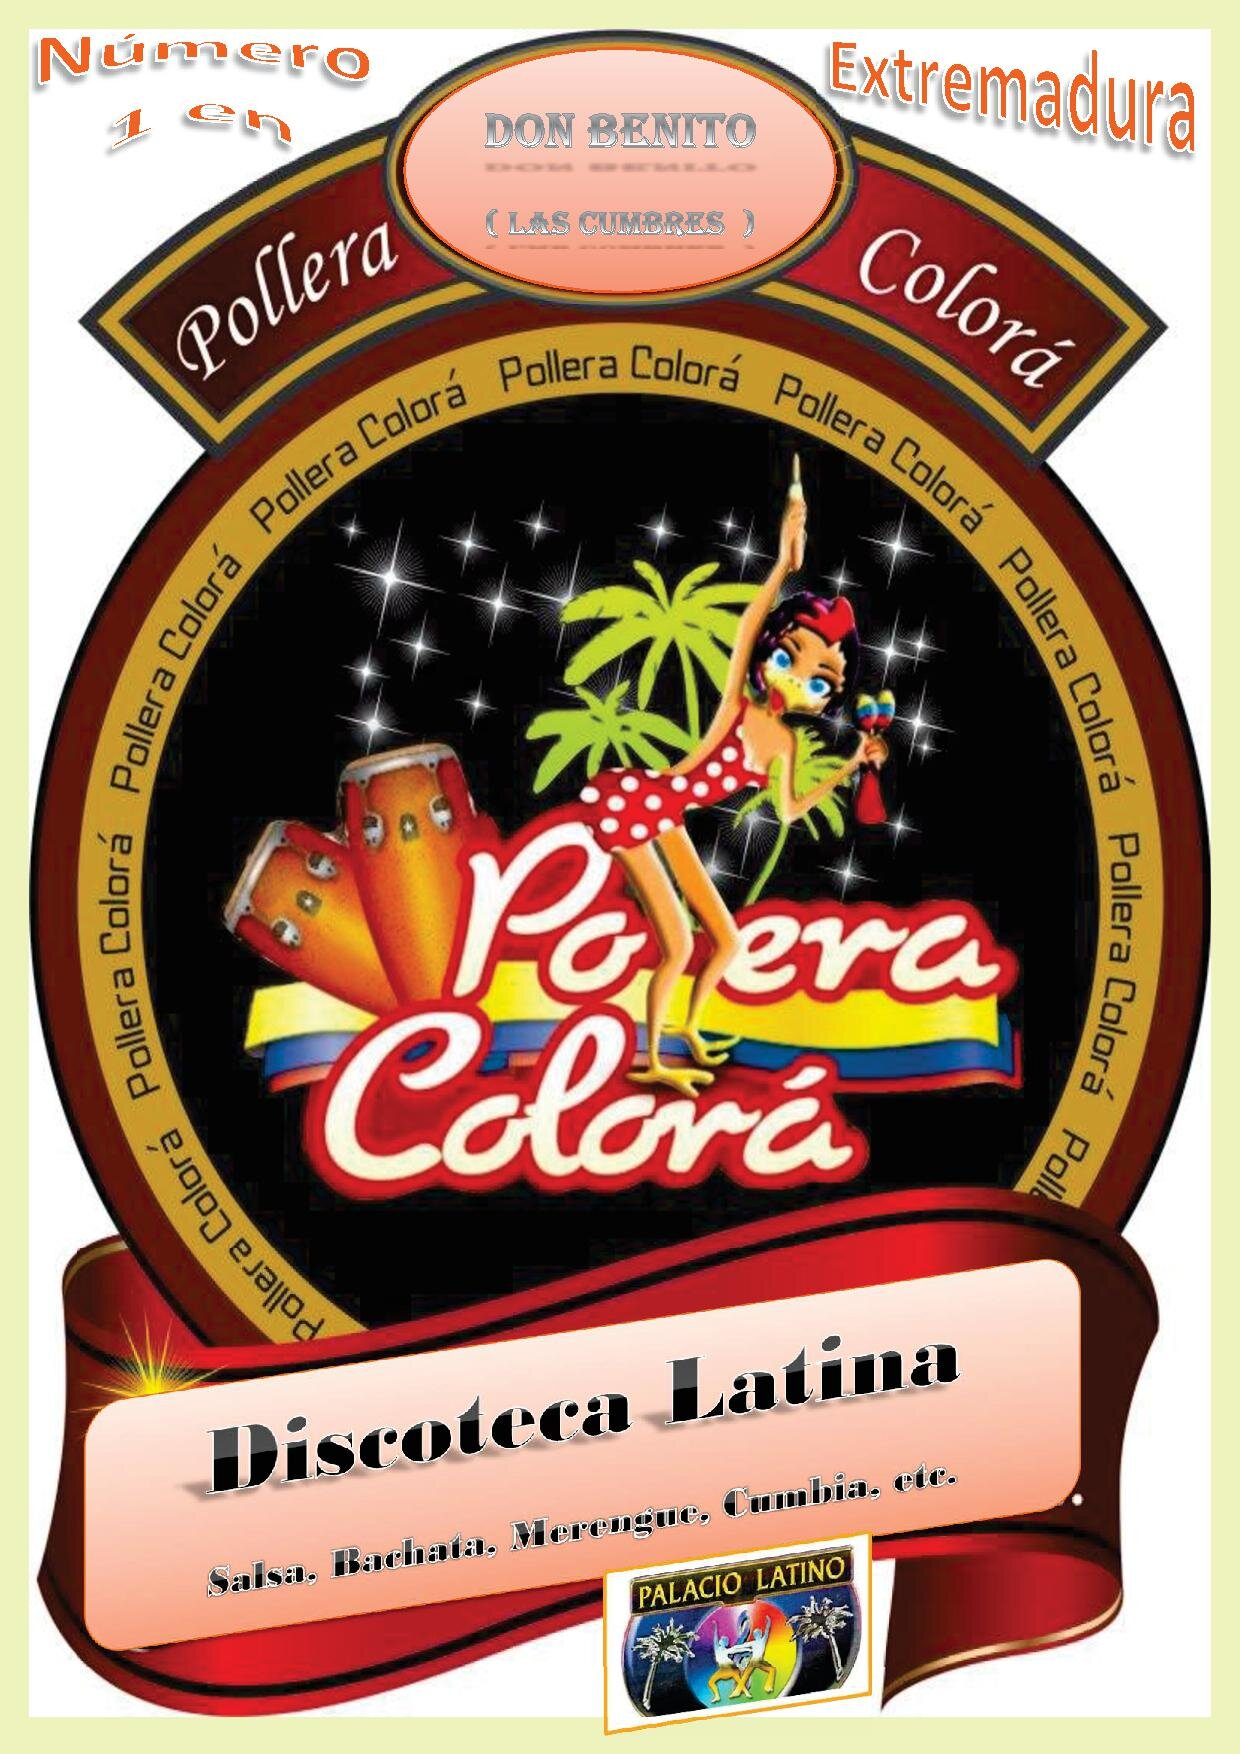 Discoteca Pollera Colora